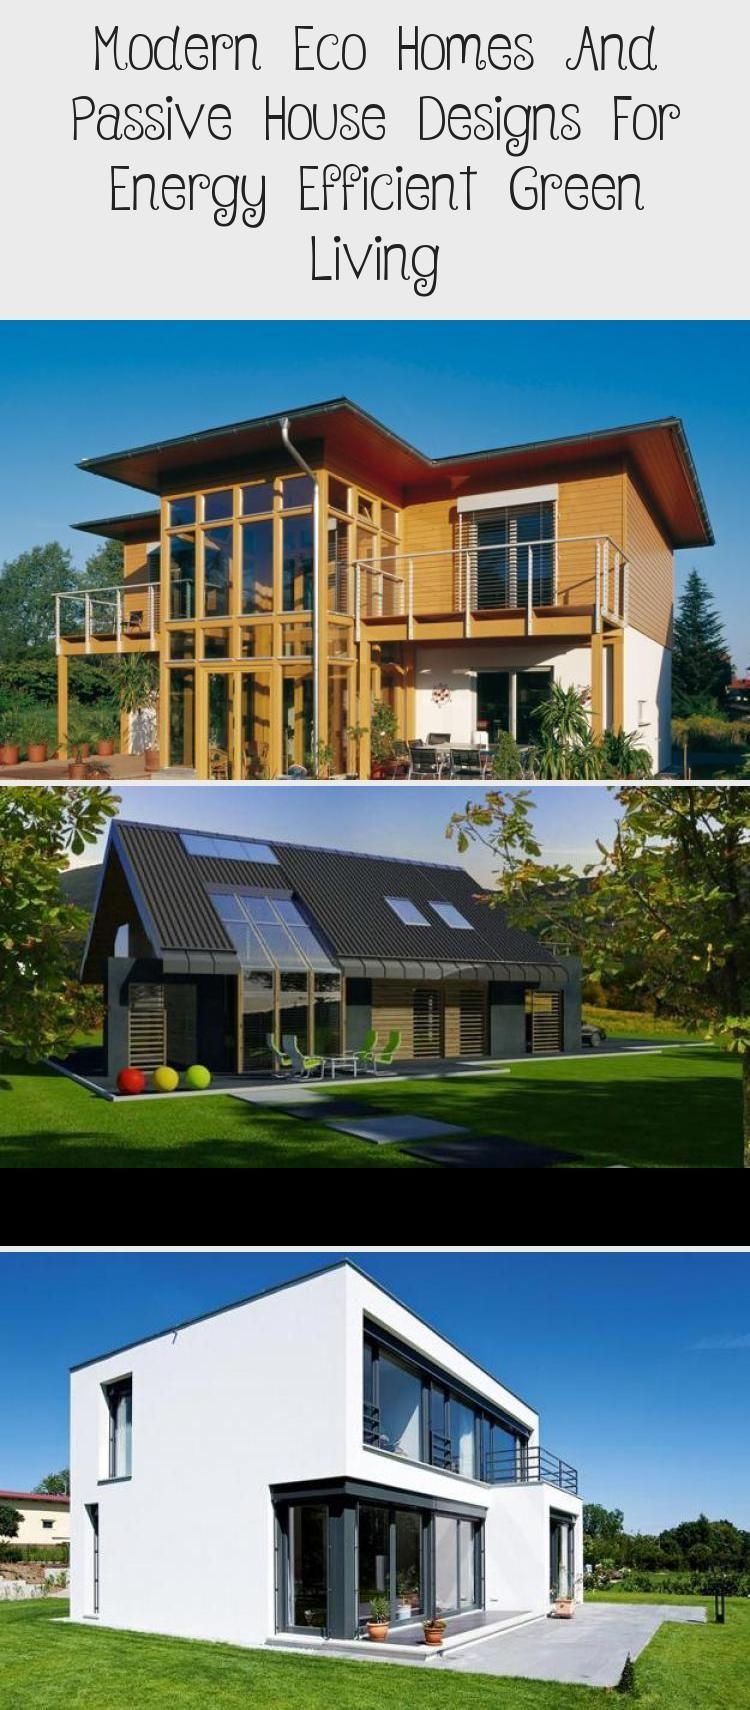 My Blog Passive House Design Natural Ventilation Systems Simple House Exterior Design